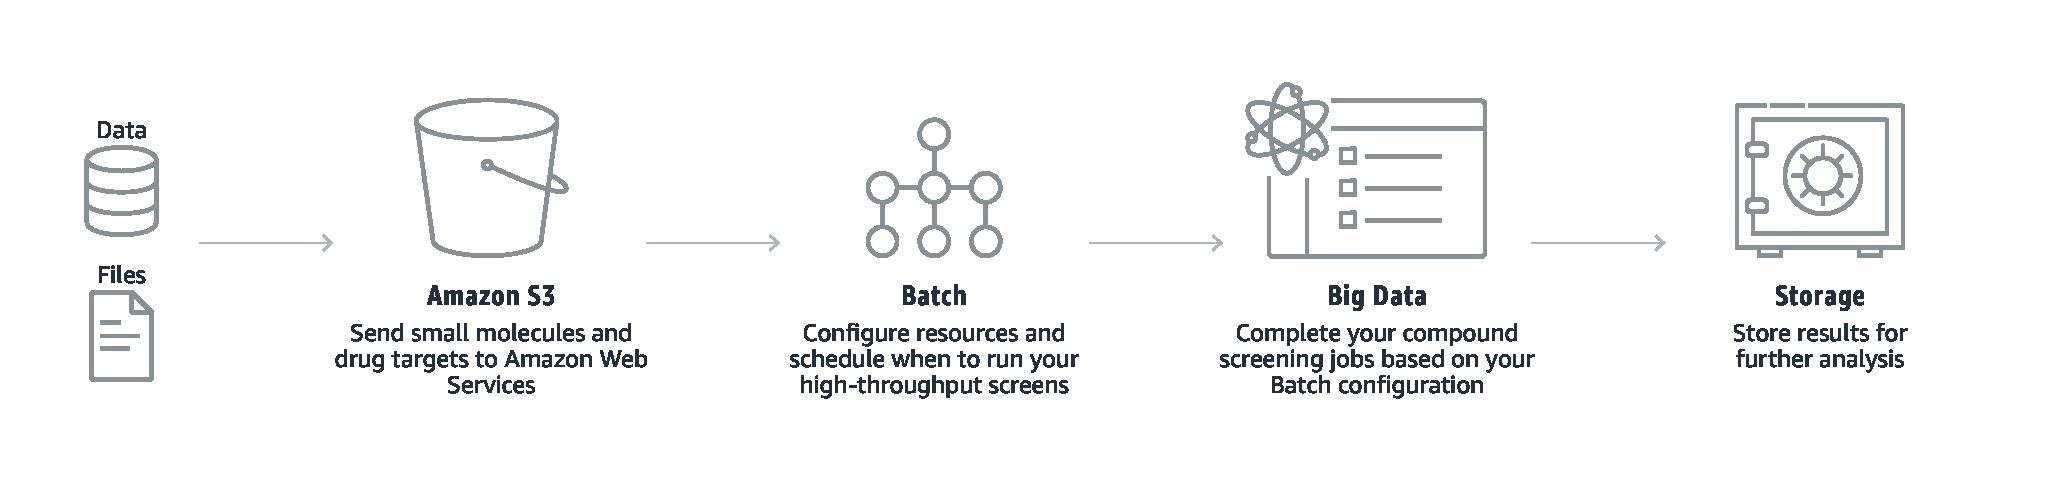 Dilithium_flowchart-diagrams_UseCase1-ScreeningforPharma@2x_China